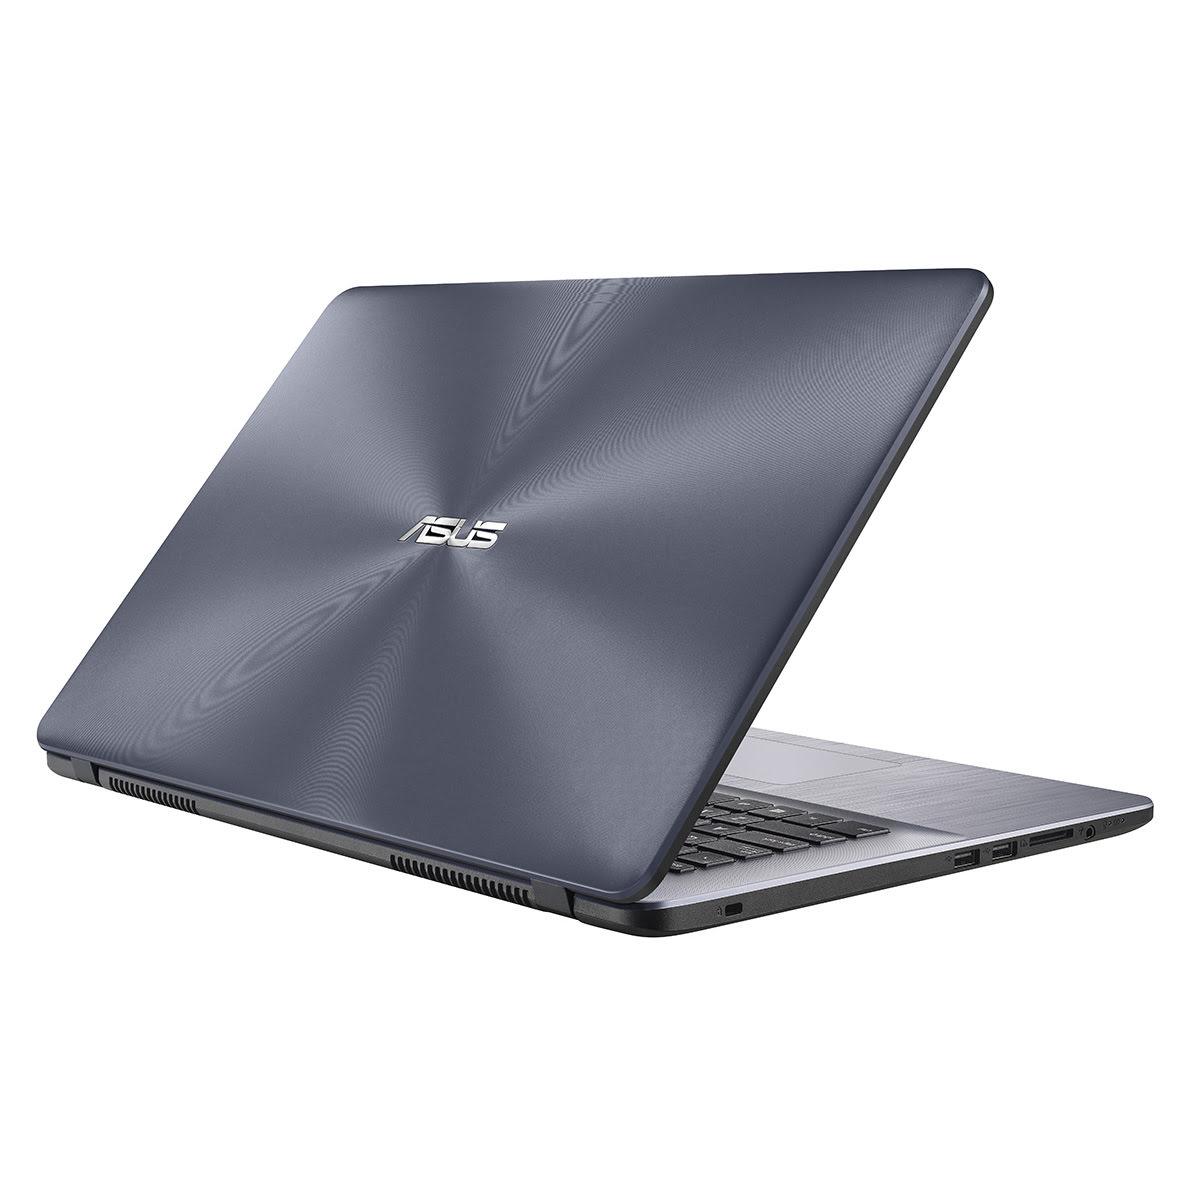 Asus 90NB0EV1-M04870 - PC portable Asus - Cybertek.fr - 4